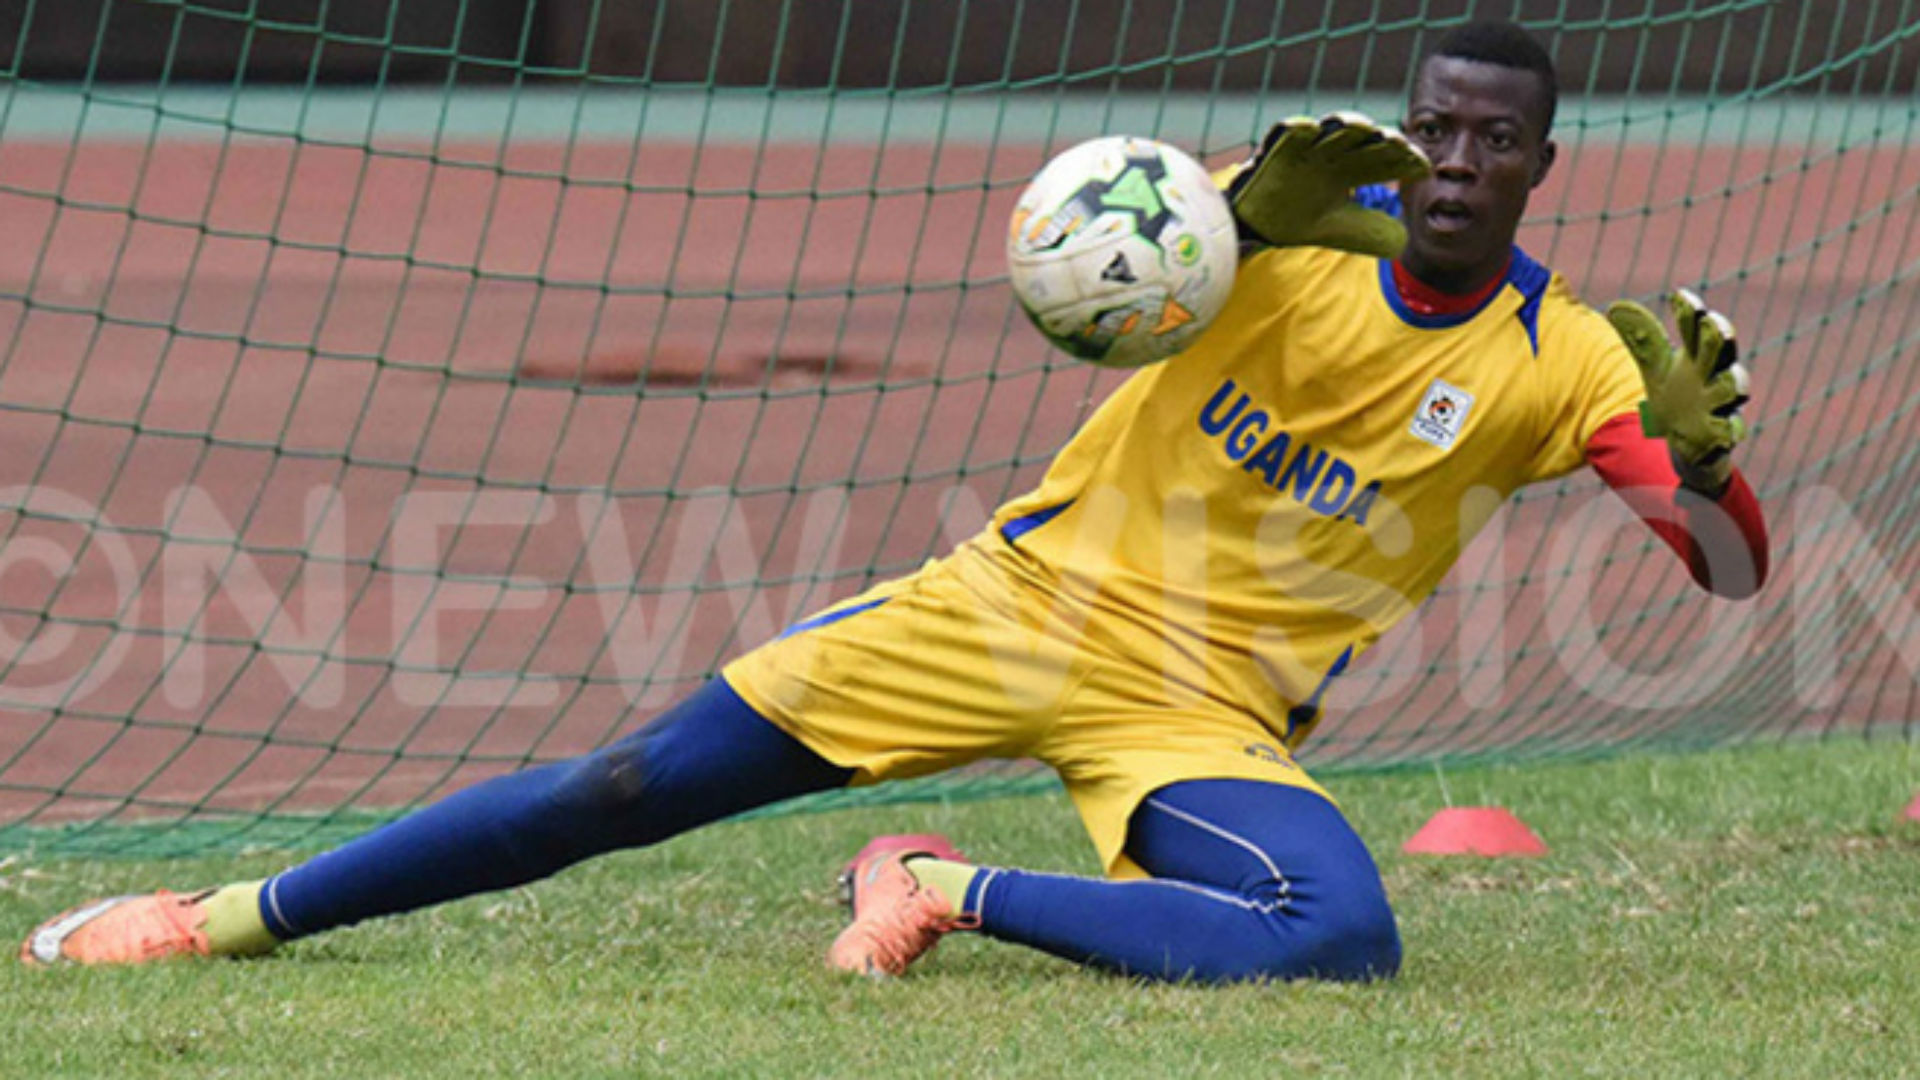 Watenga: Ugandan goalkeeper rubbishes Sofapaka match-fixing claims